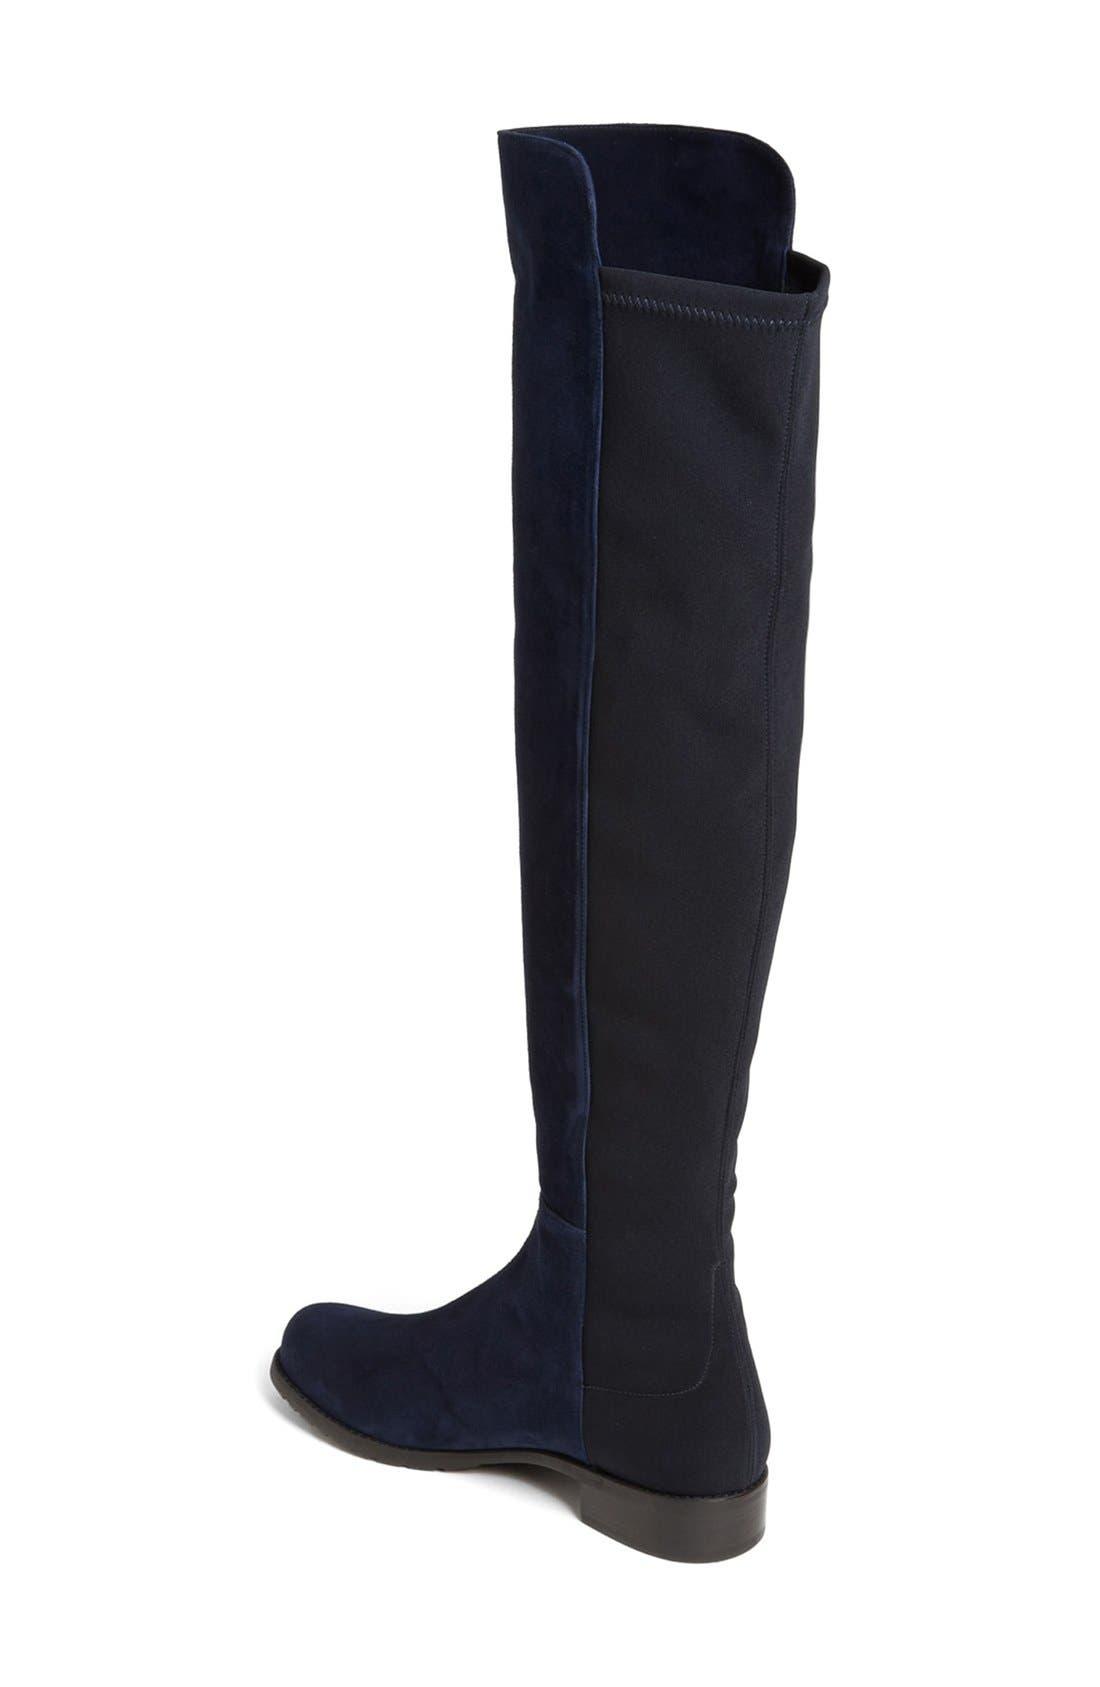 Alternate Image 2  - Stuart Weitzman 5050 Over the Knee Leather Boot (Women)